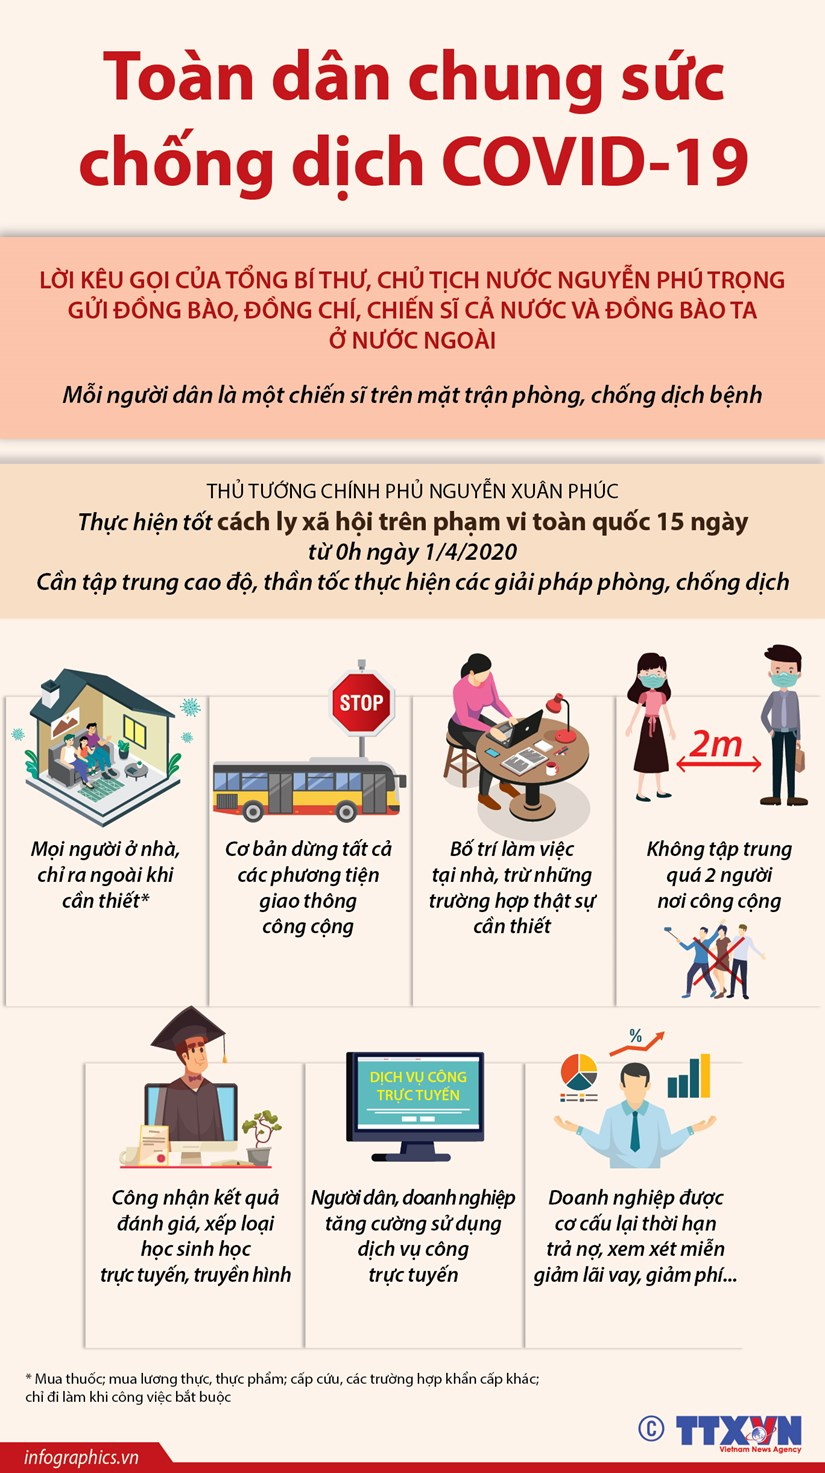 [Infographics] Toan dan Viet Nam chung suc chong dich COVID-19 hinh anh 1